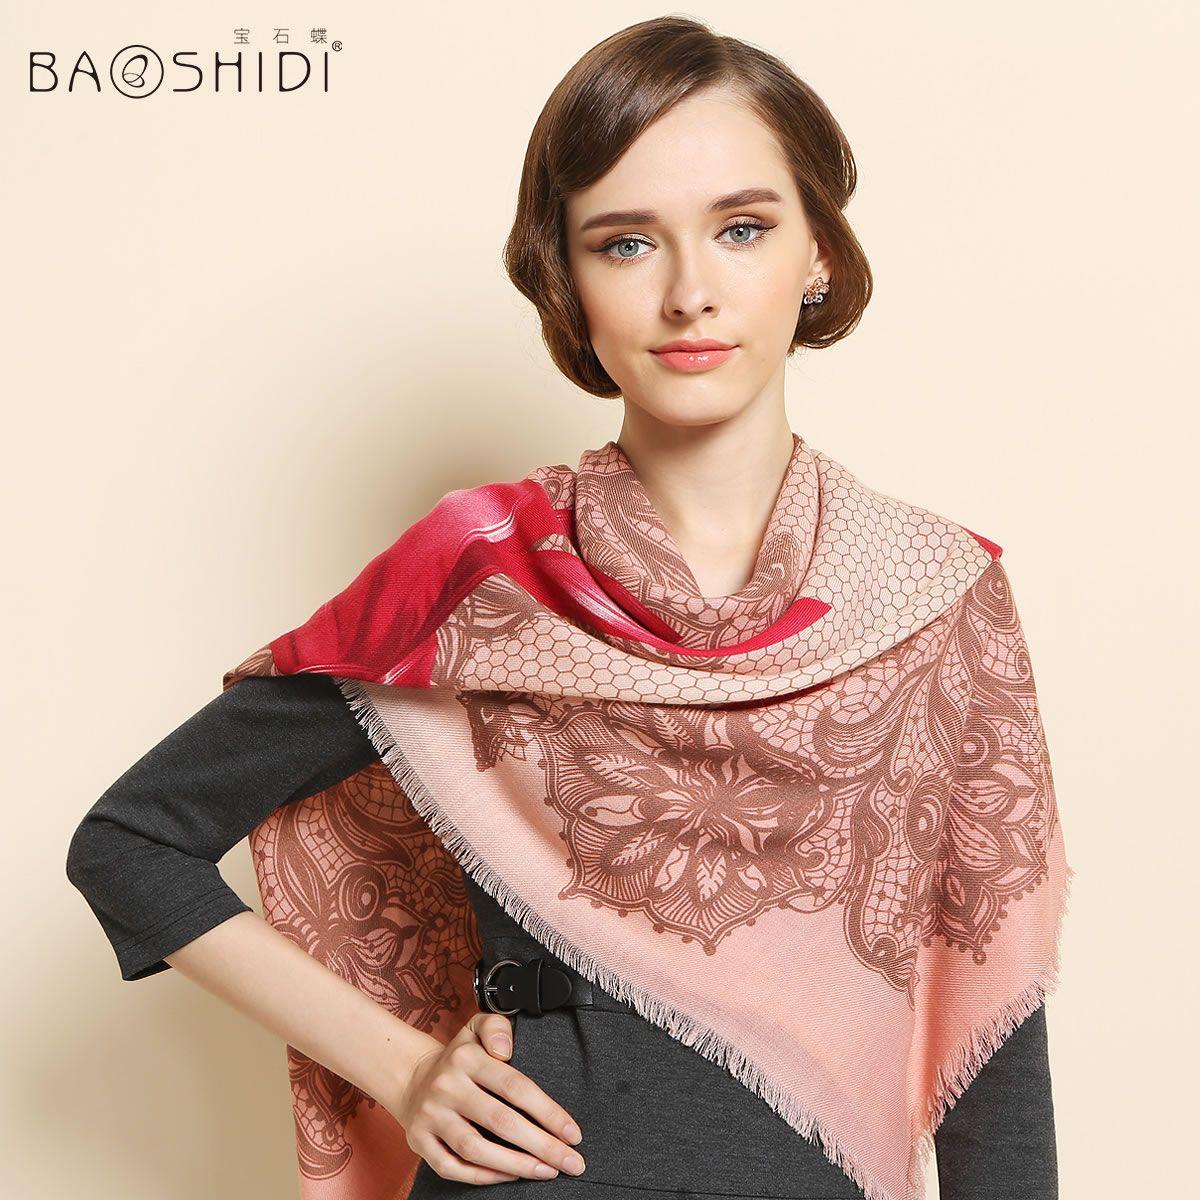 Fashion 100% Twill Wool Scarf Shawl Floral Ex-Large Square 51